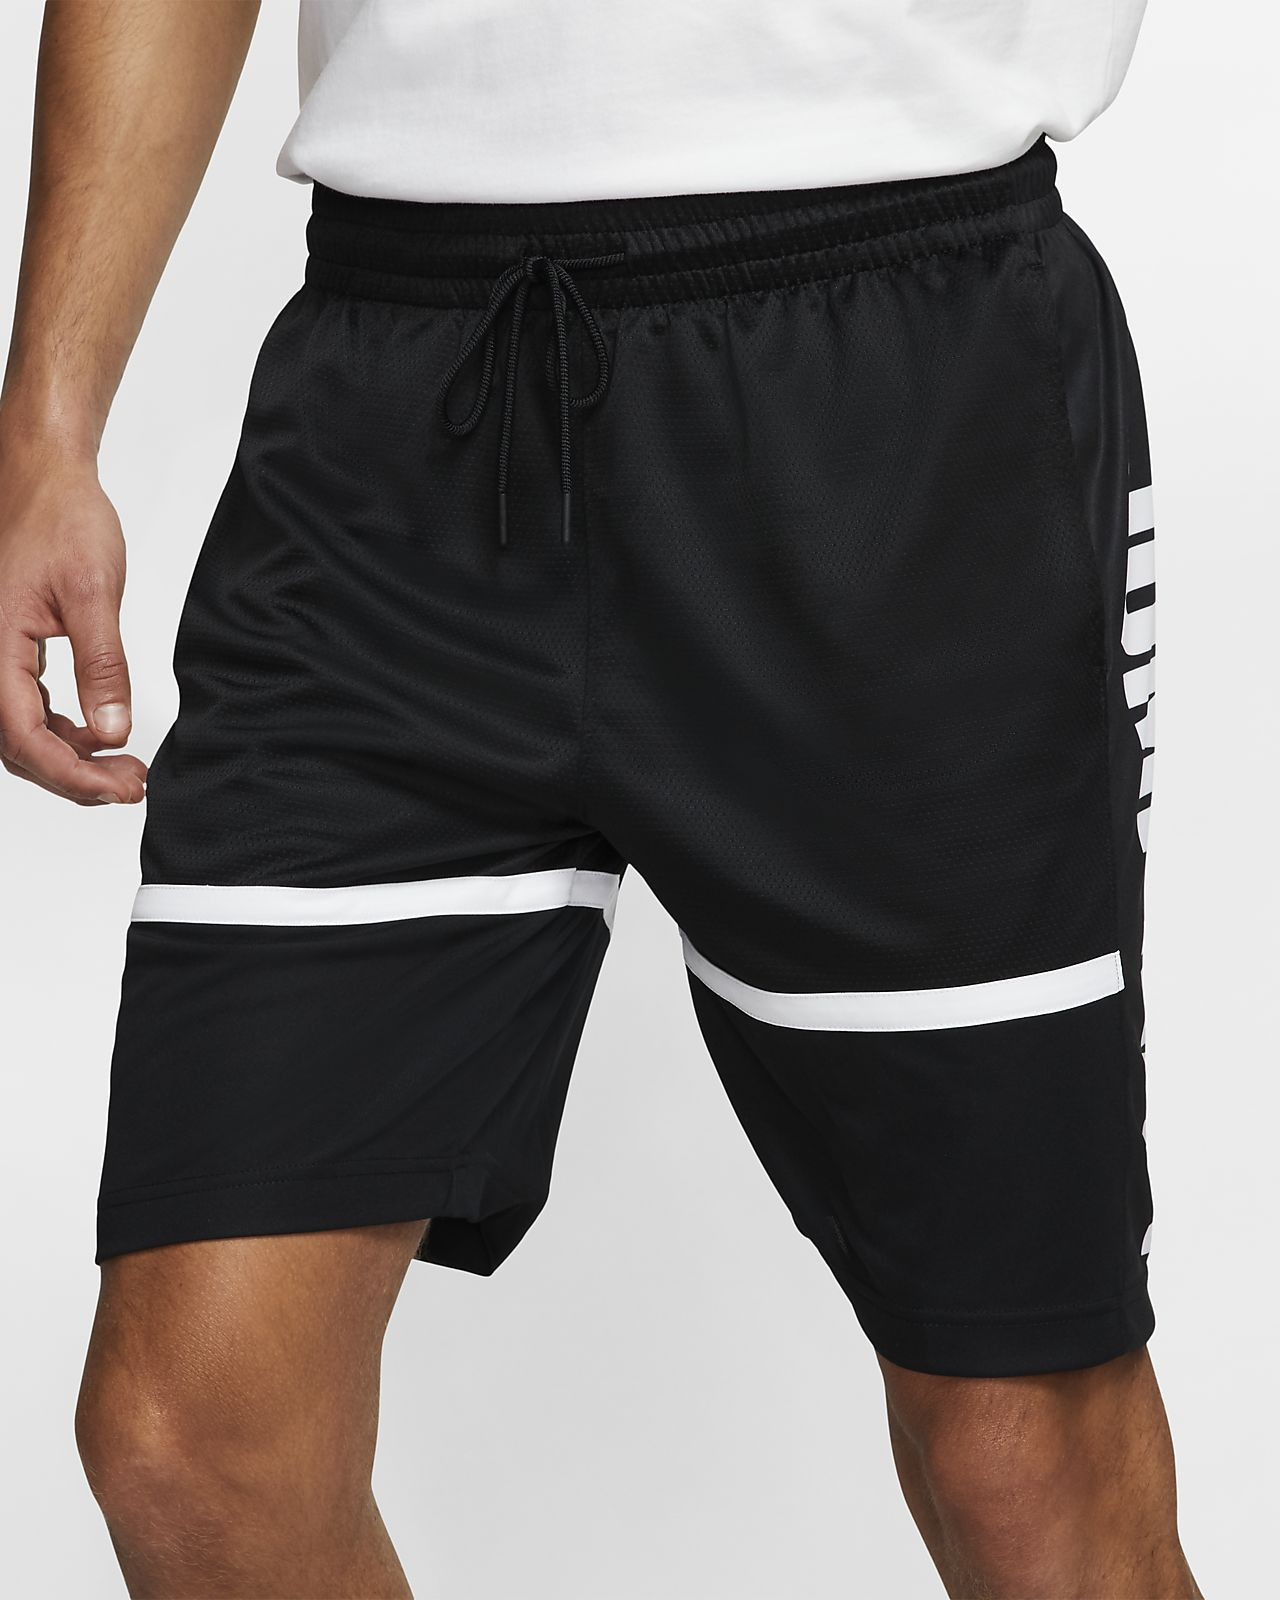 0bac2dffdc Jordan Jumpman Men's Basketball Shorts